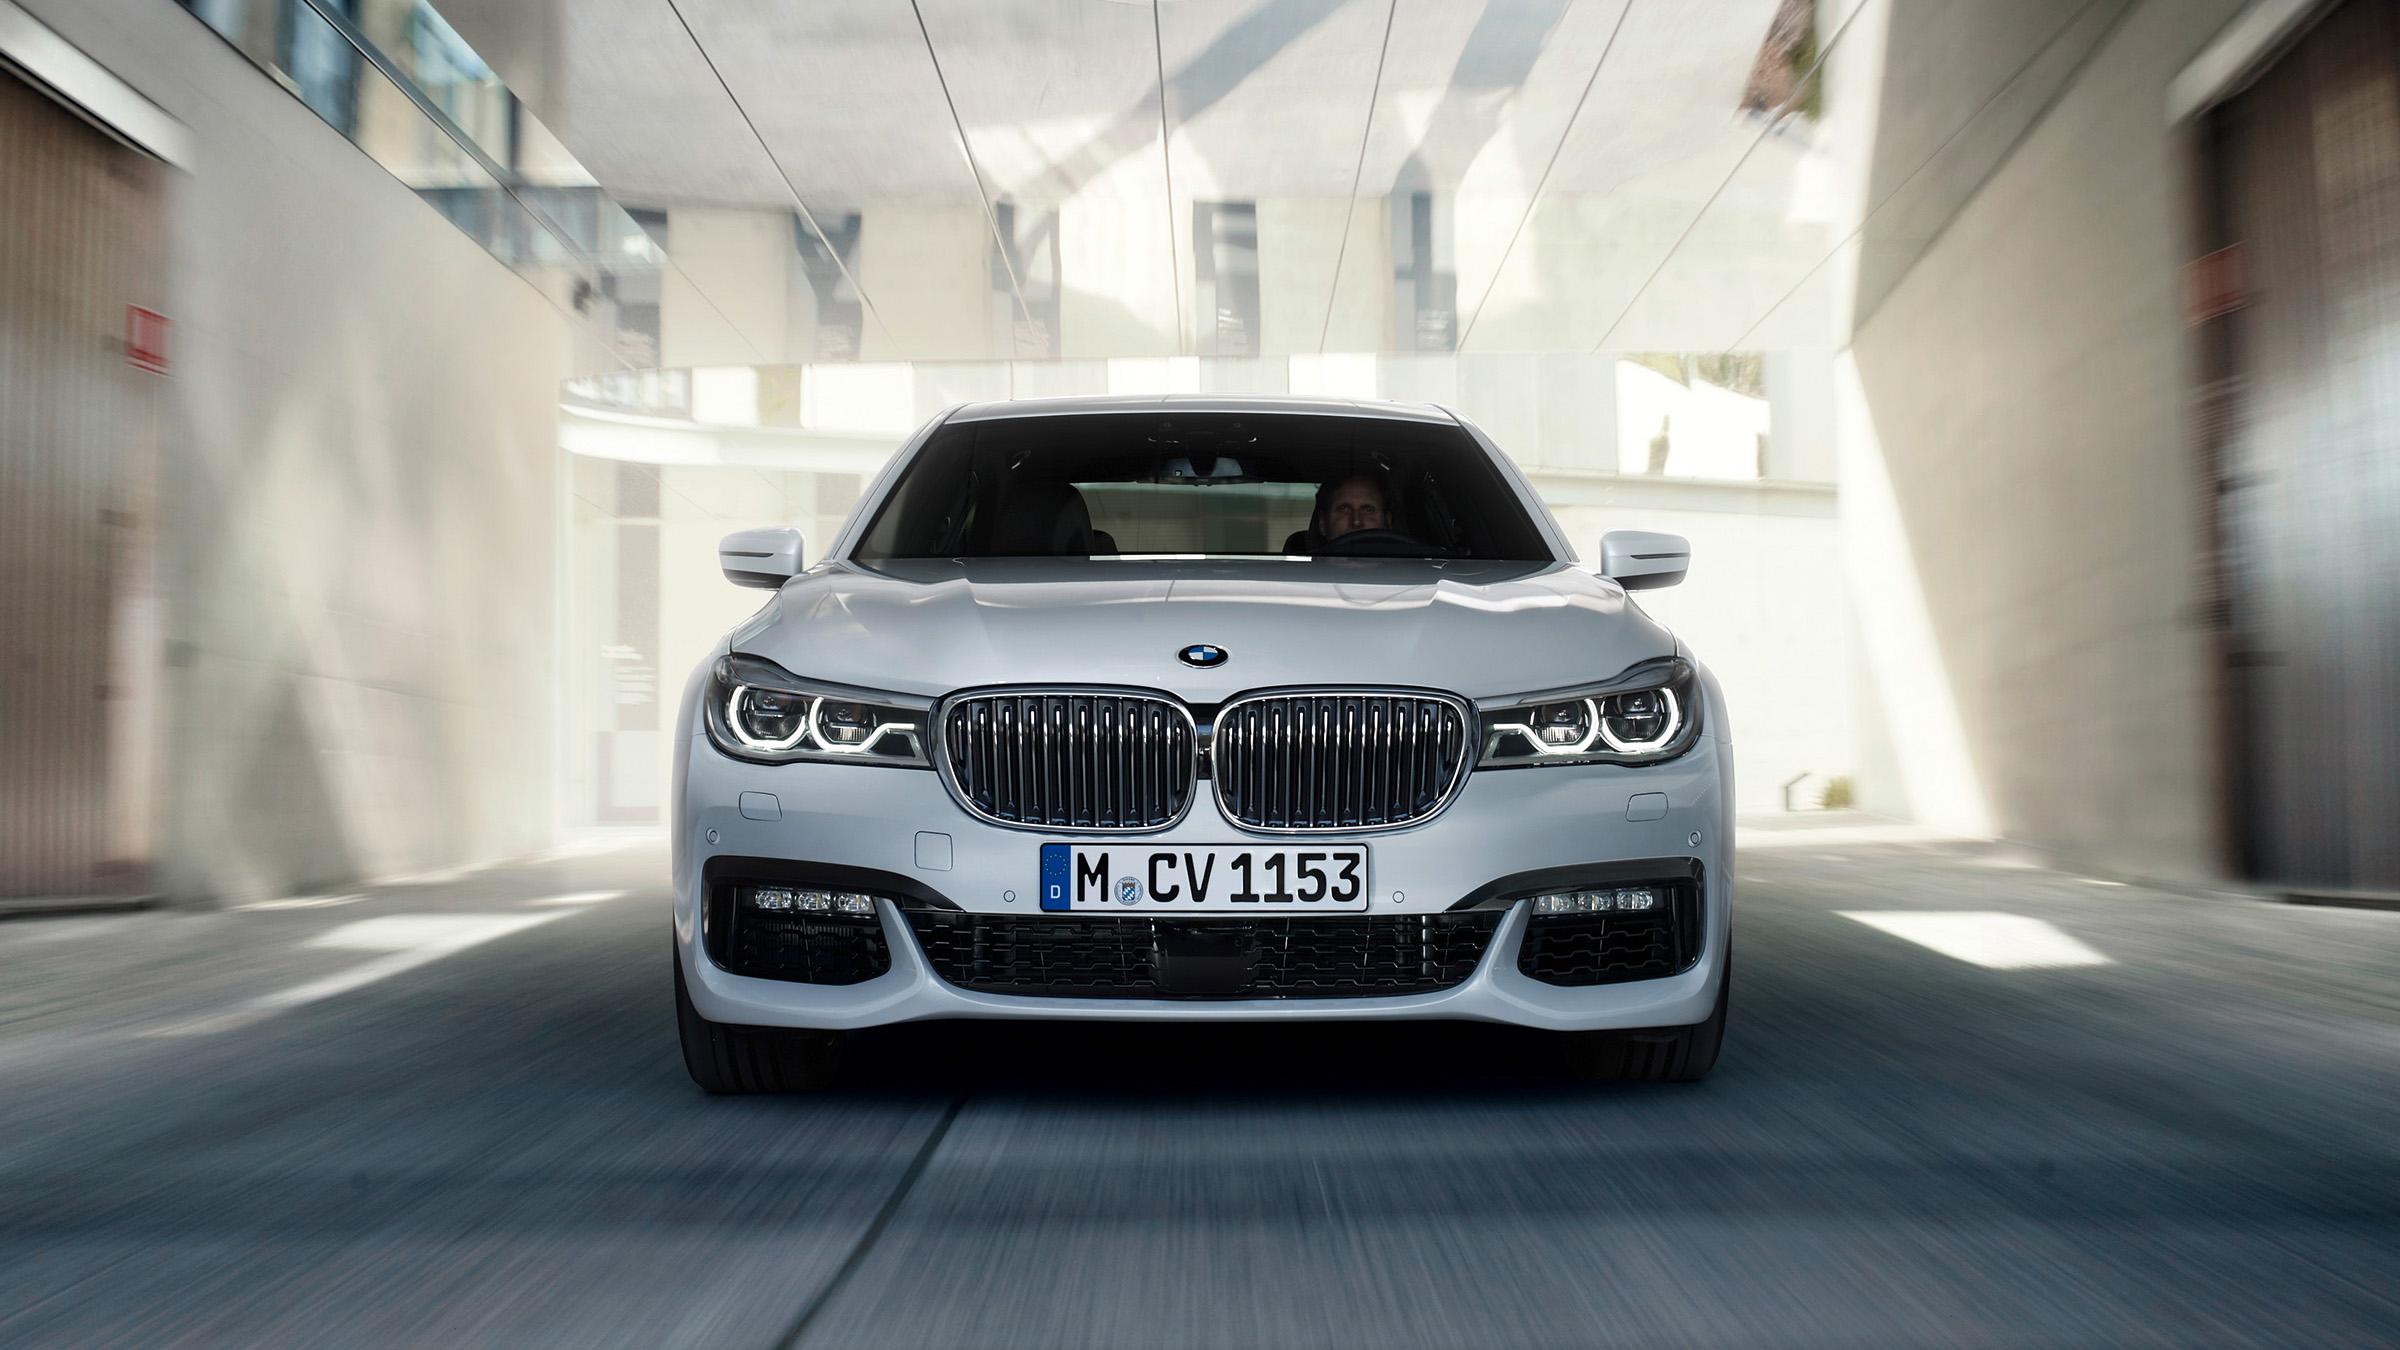 BMW_7ER_EMIR_HAVERIC_11_2400